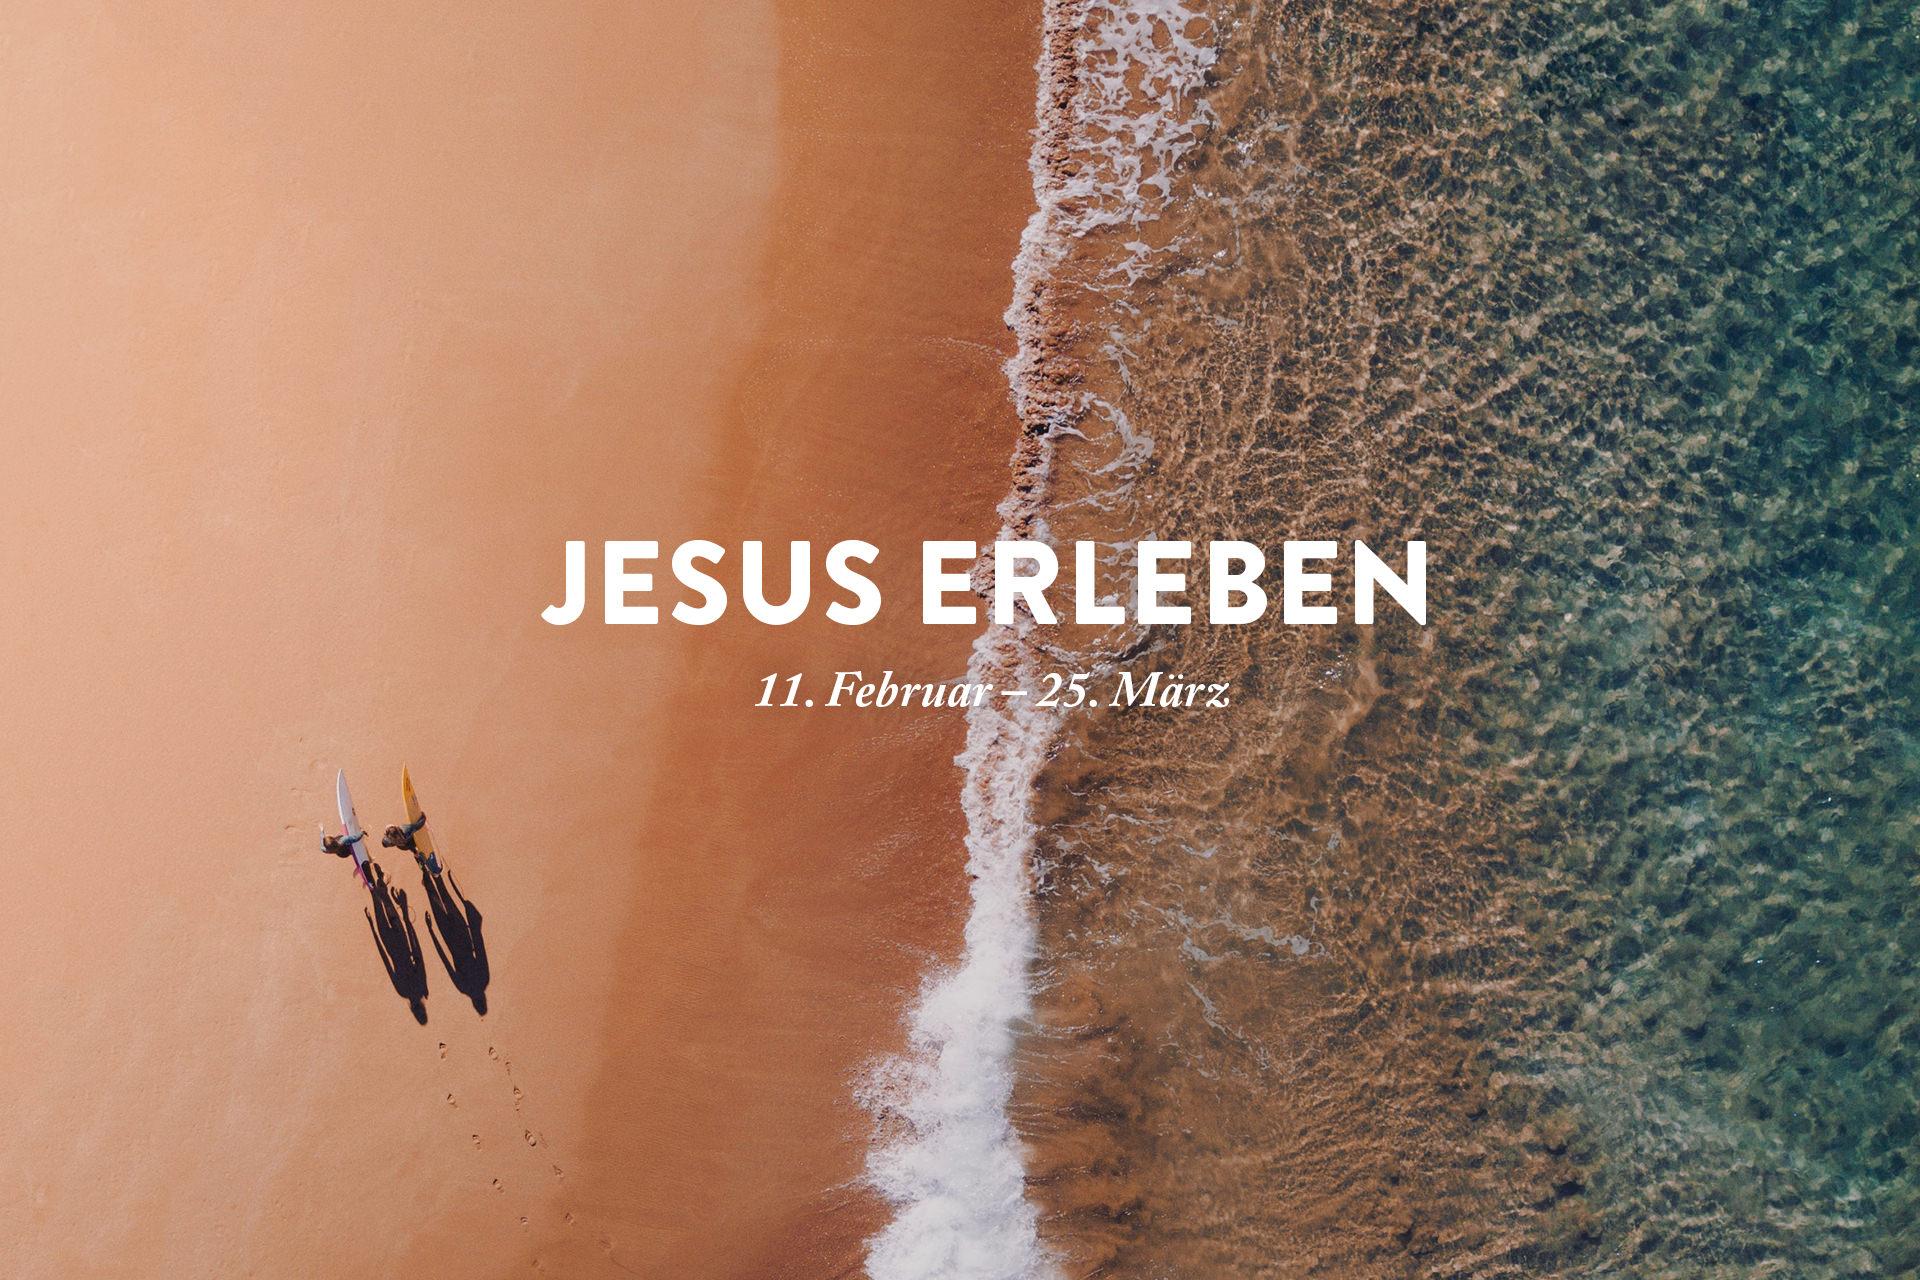 Jesus erleben